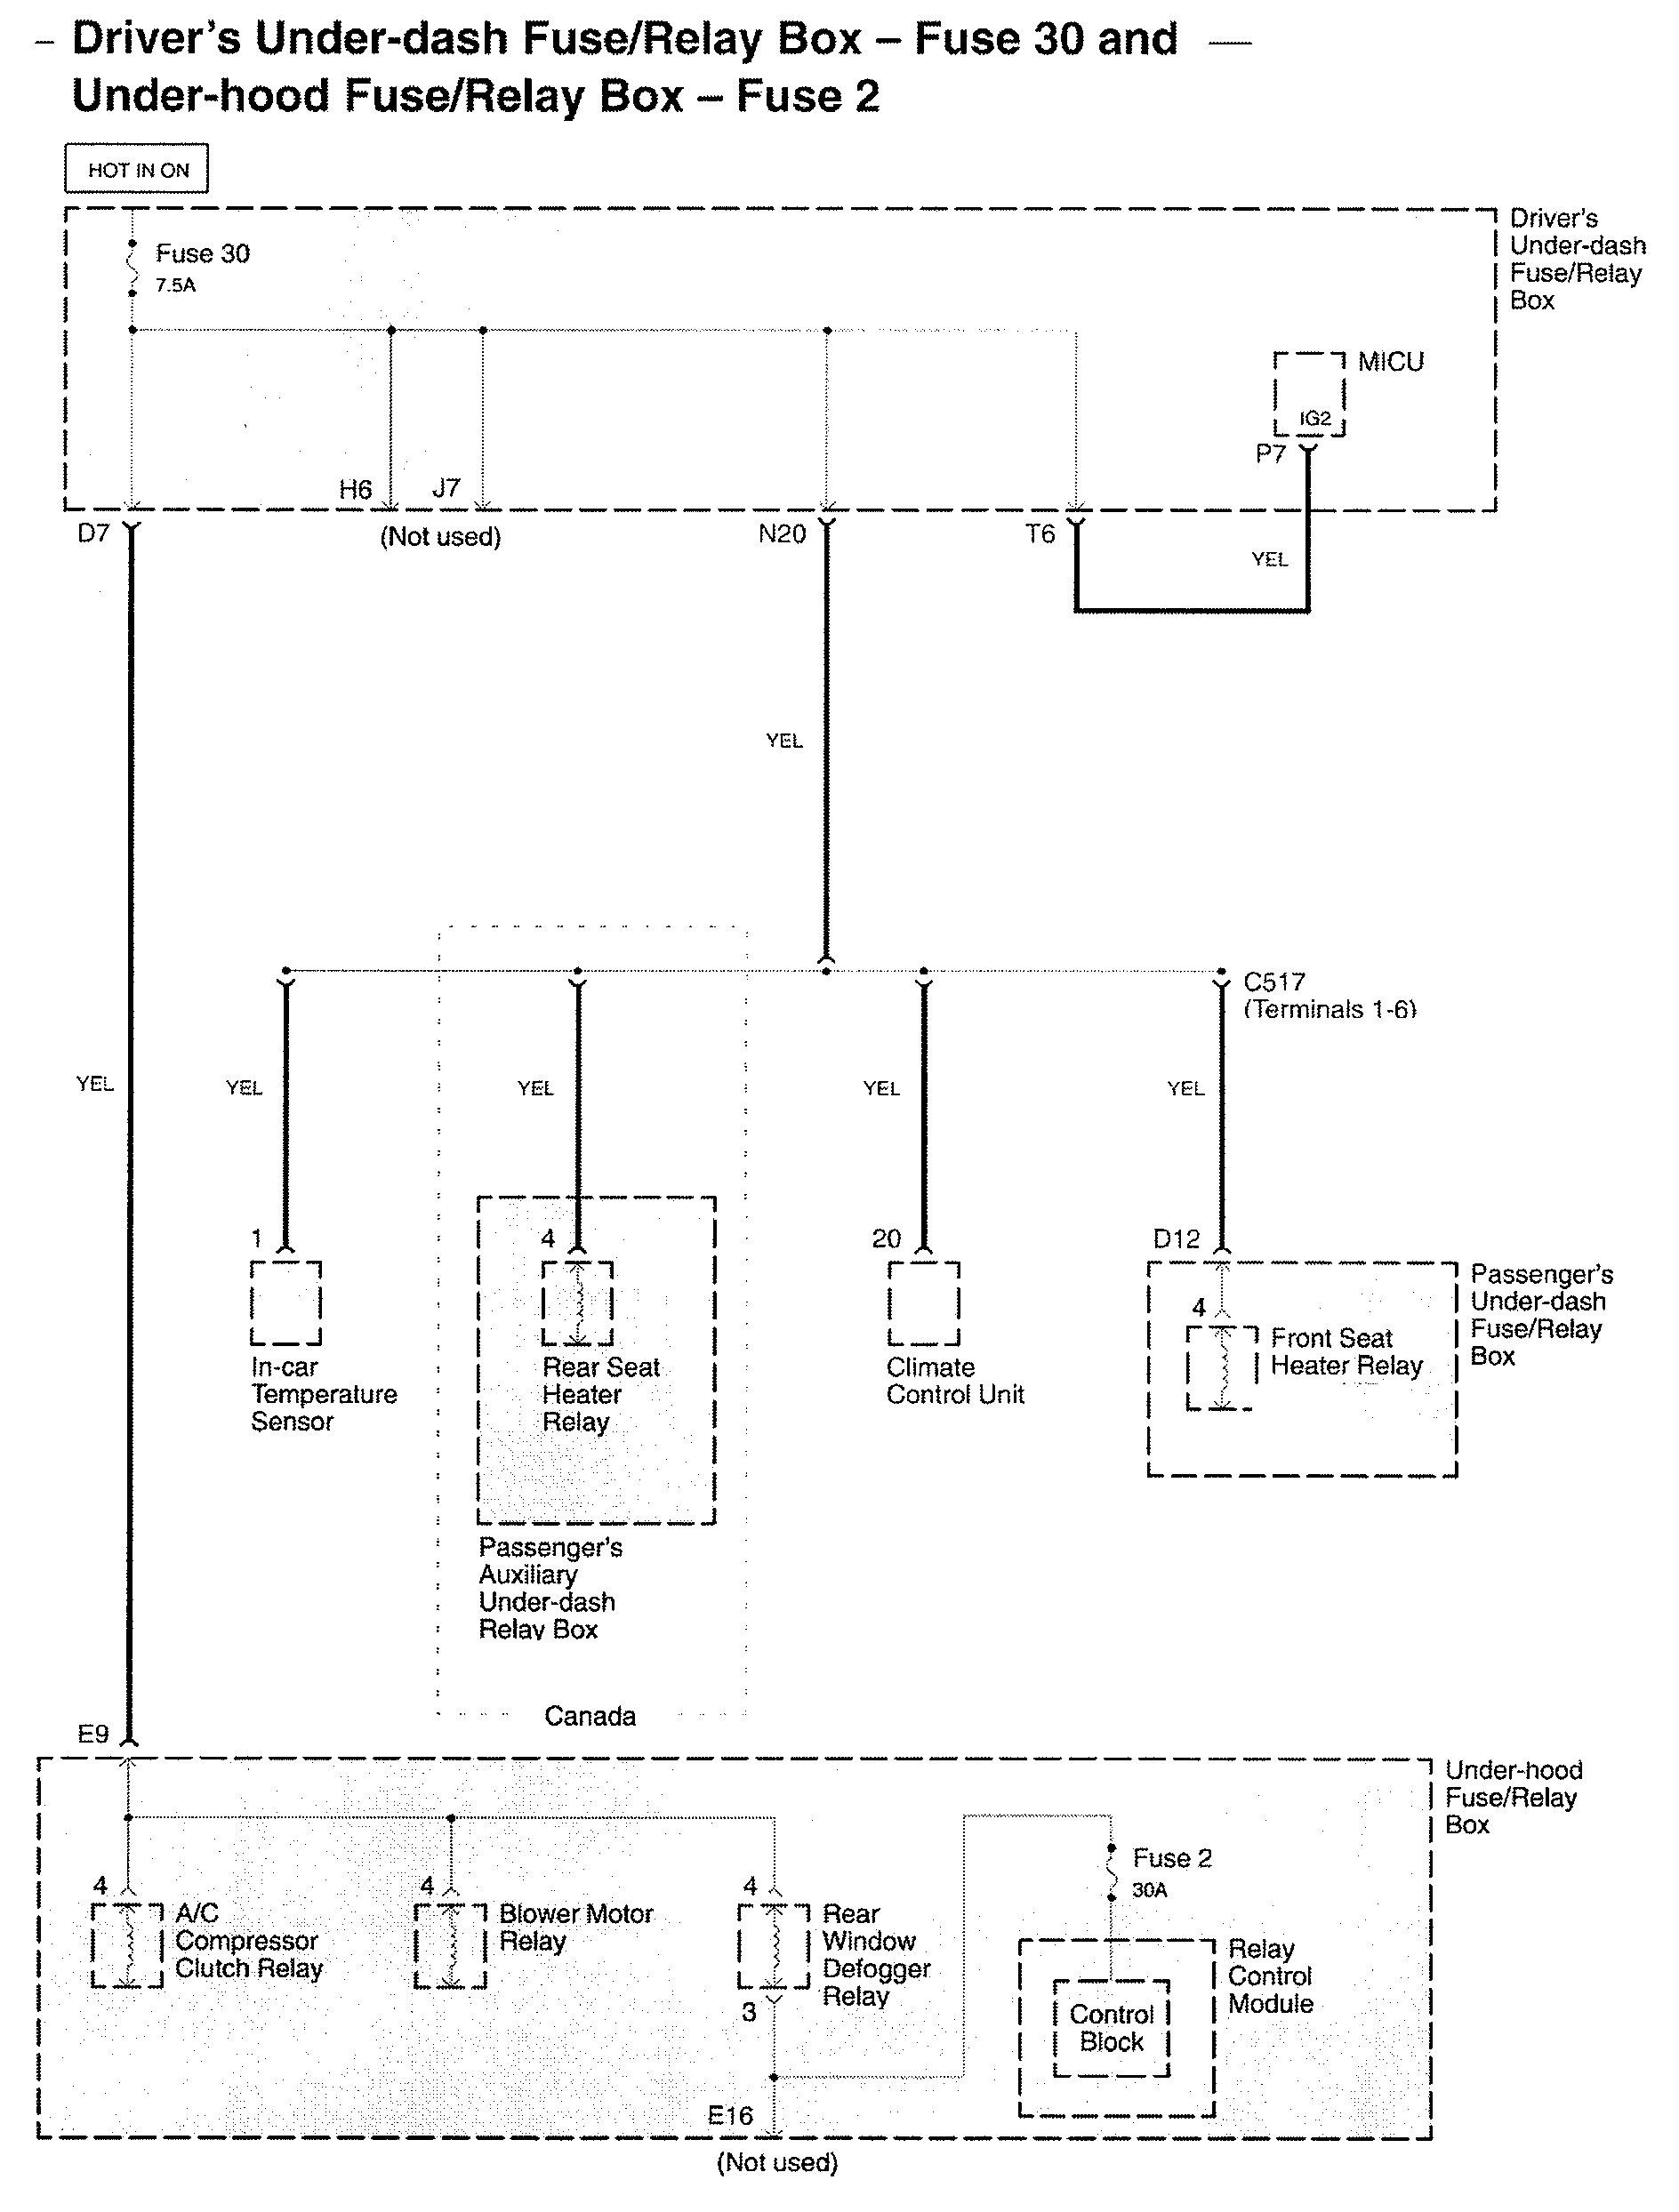 Amazing parrot ck3100 wiring diagram ideas best images for wiring exelent parrot ck3100 wiring diagram ensign best images for wiring asfbconference2016 Gallery